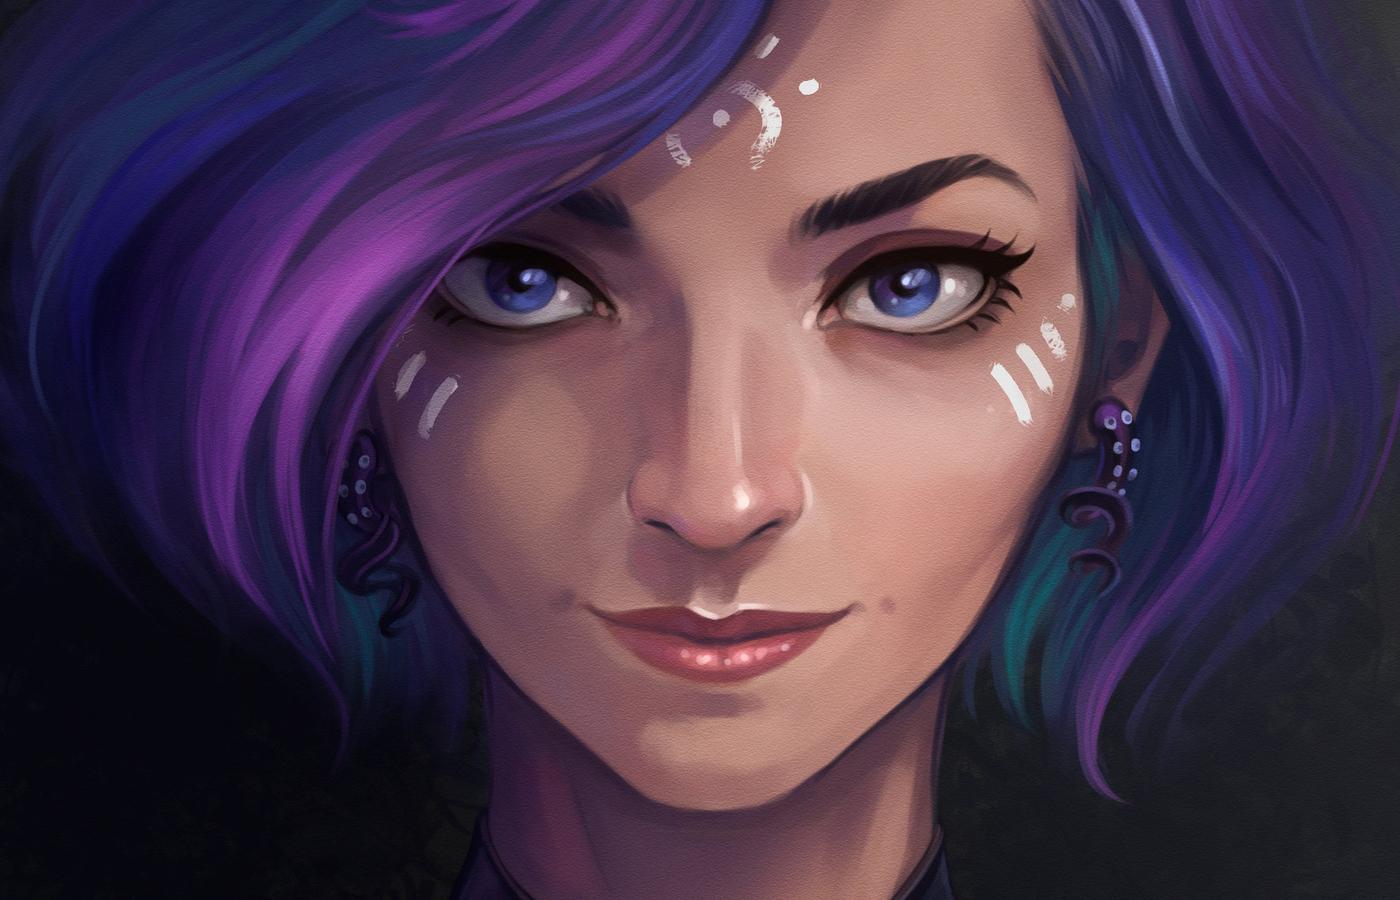 purple-hair-artistic-girl-ii.jpg